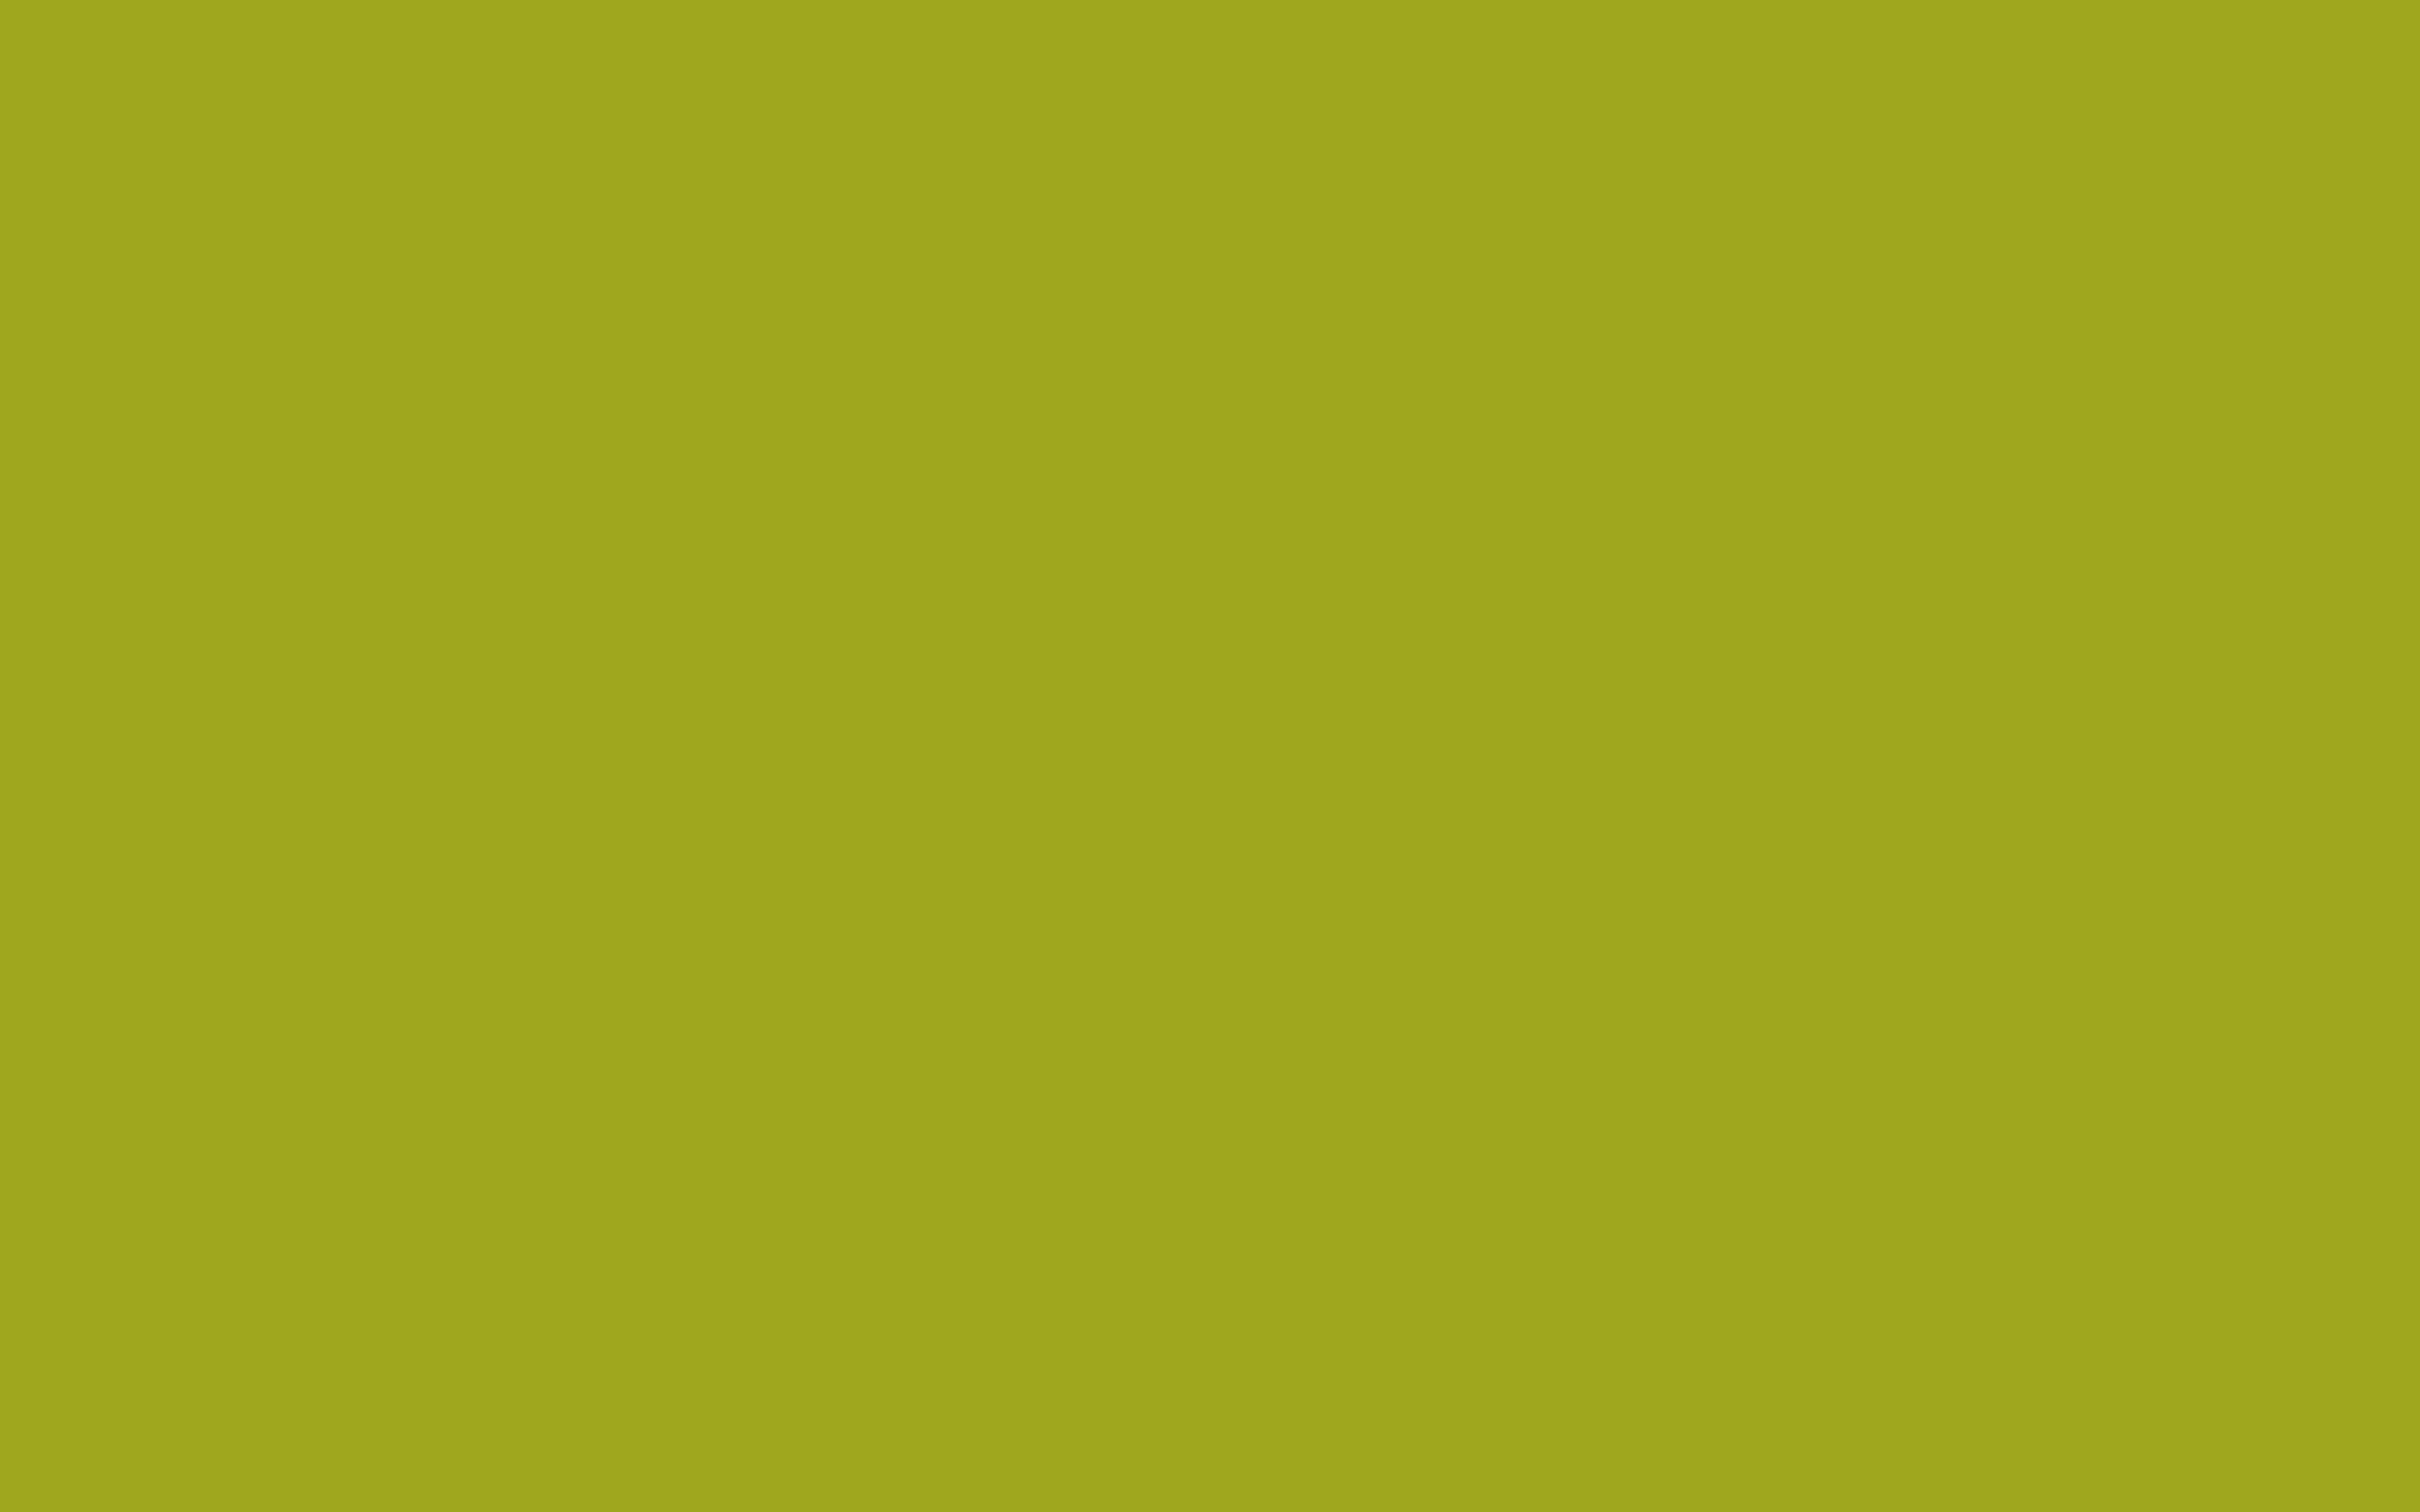 2560x1600 Citron Solid Color Background